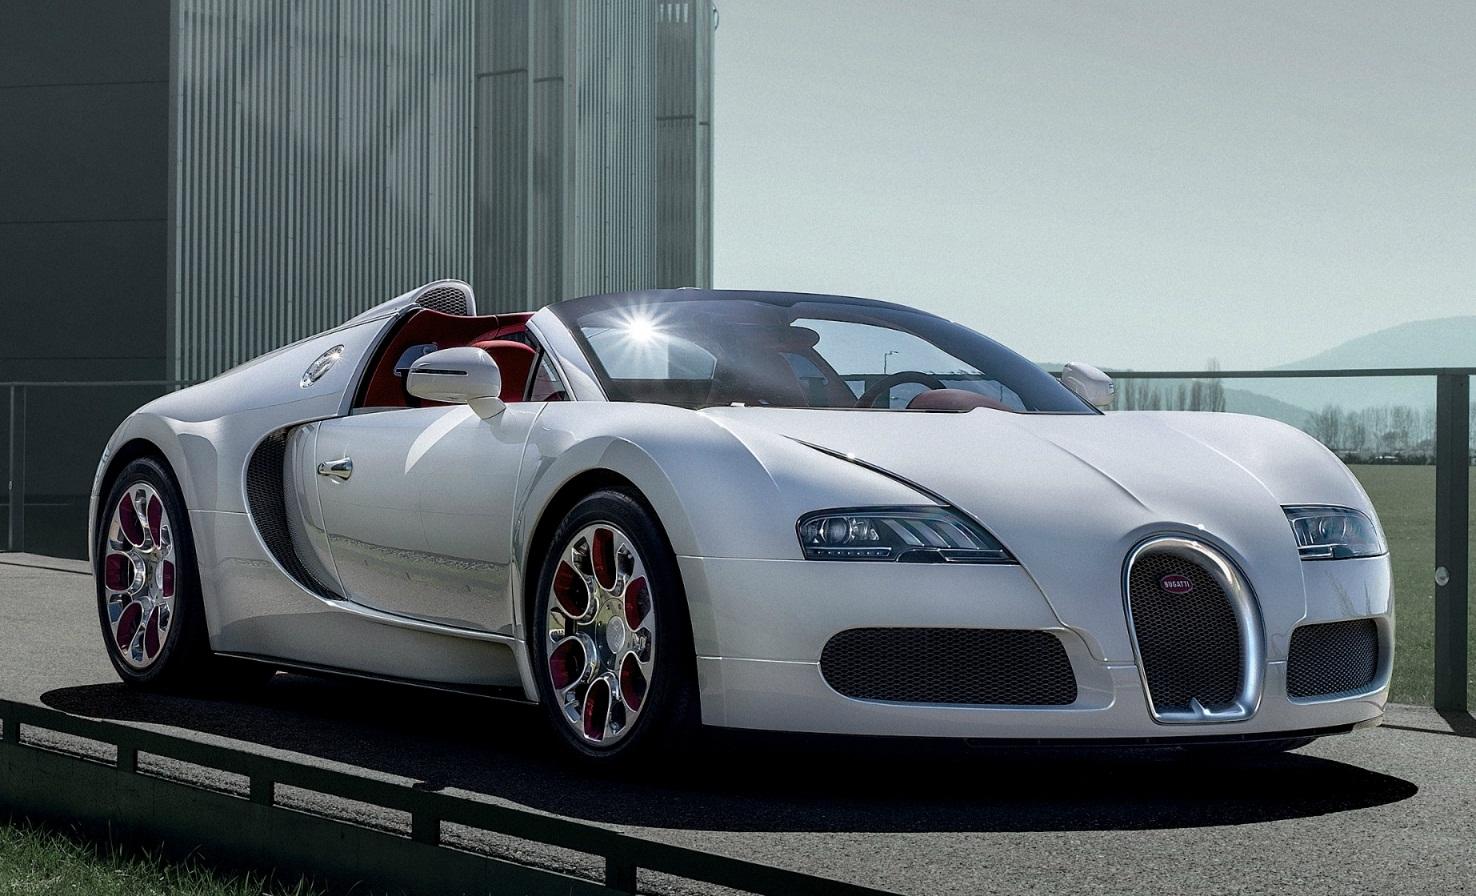 sport car garage bugatti veyron grand sport wei long 2012